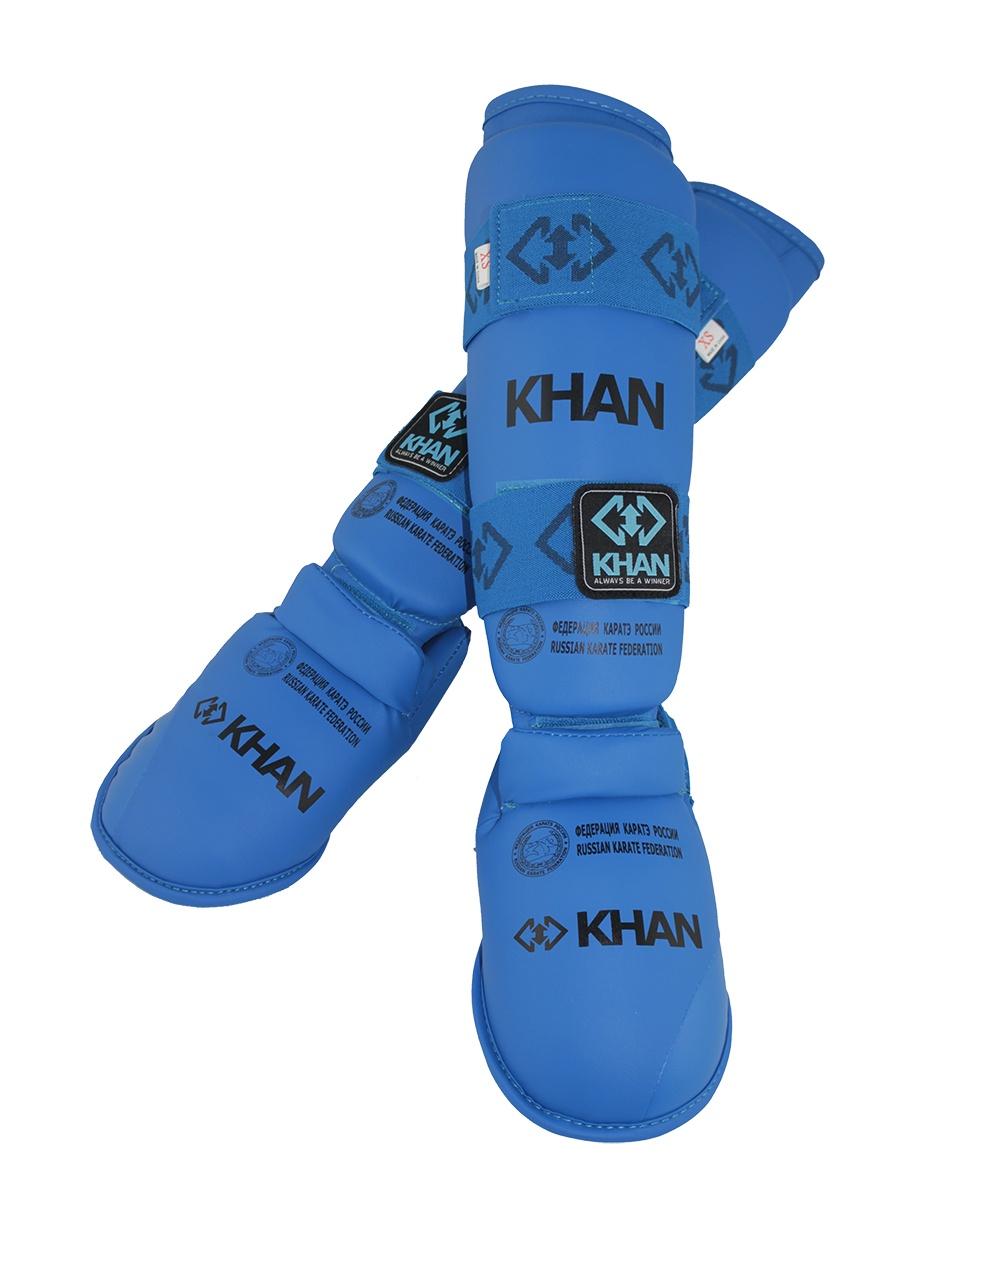 Защита голени и стопы Khan Каратэ ФКР, FKR23001_7, синий, размер М форма для карате khan classic kumite фкр fkr3000 цвет белый размер 110